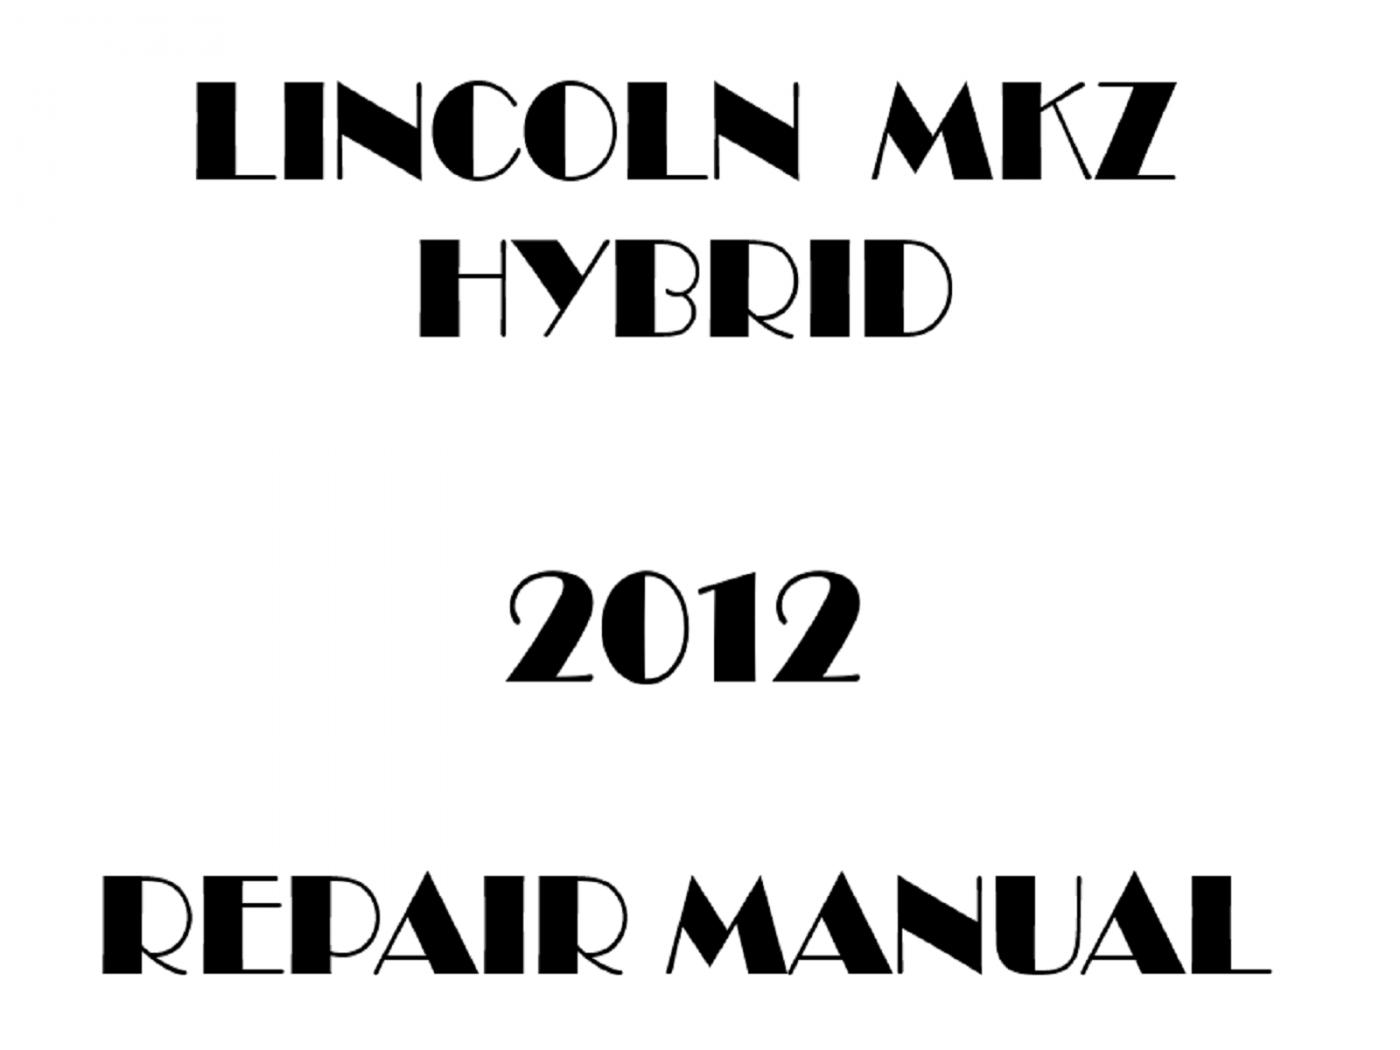 2012 Lincoln MKZ Hybrid repair manual